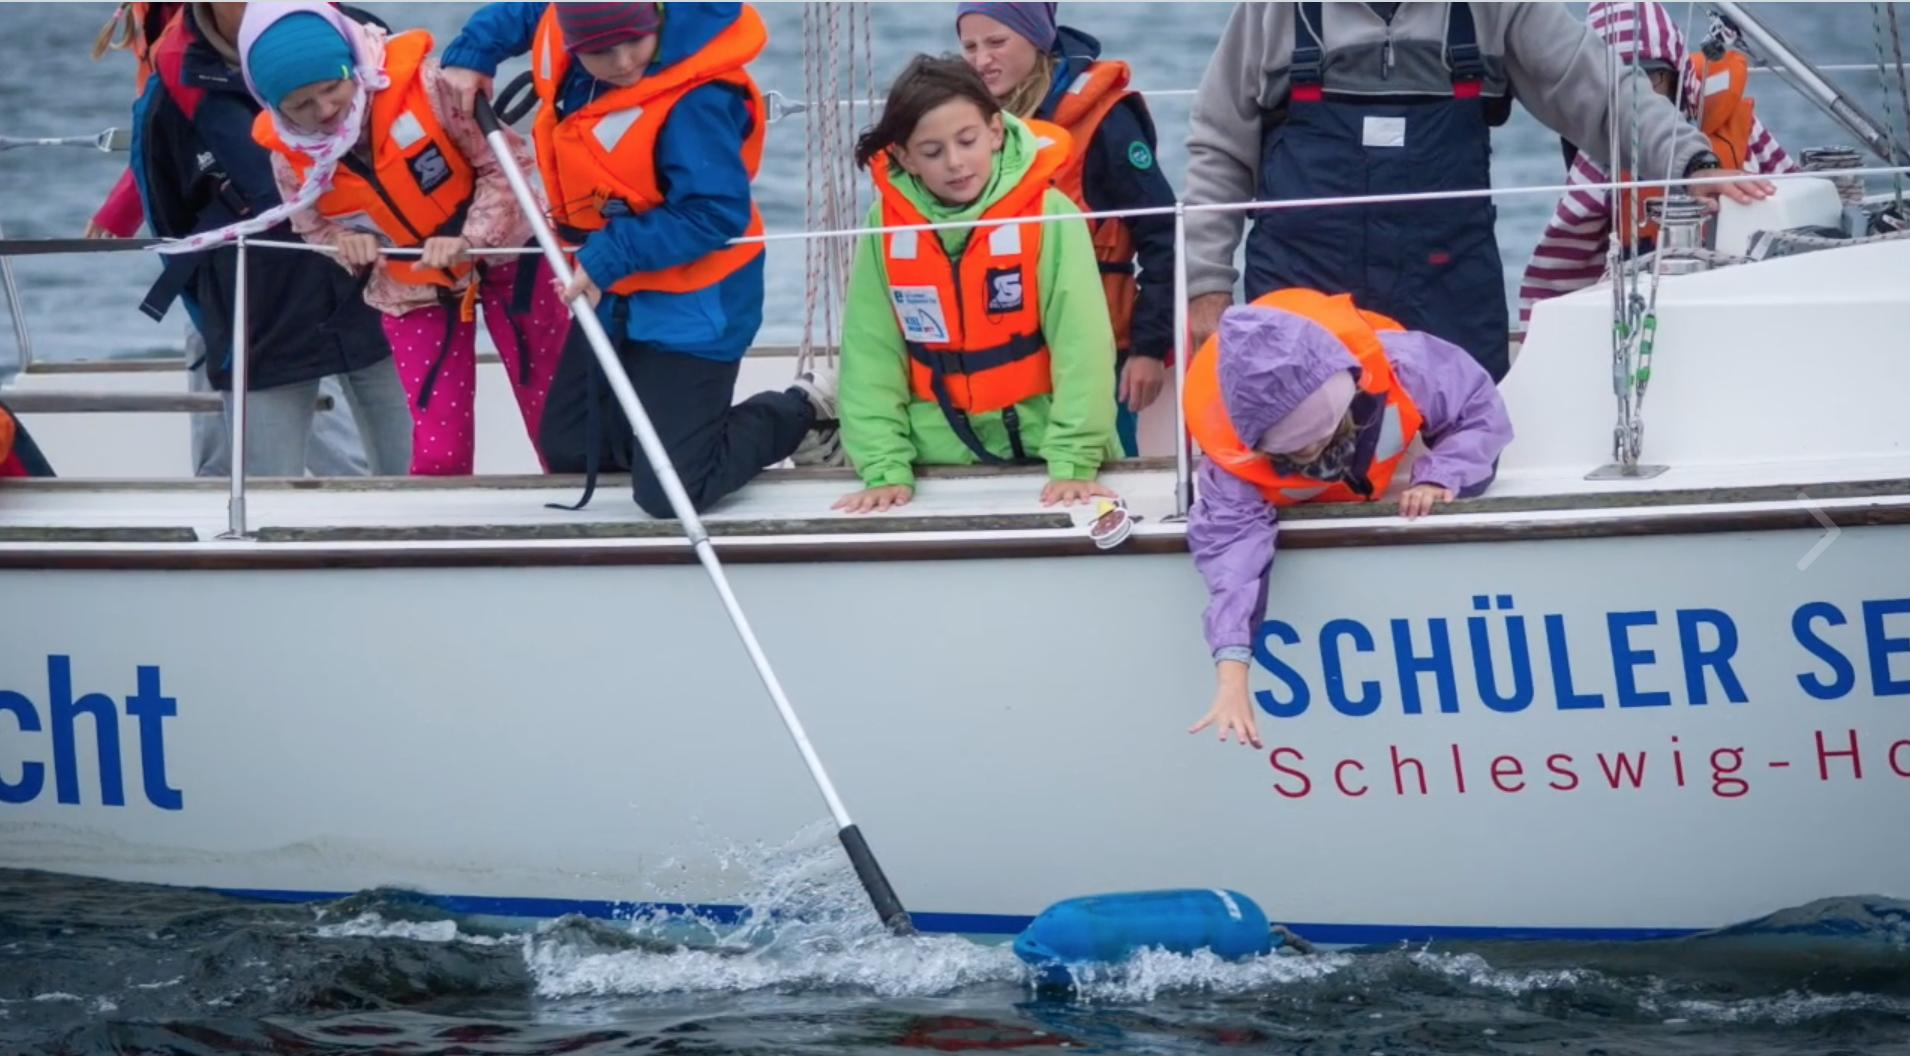 Foto-AG filmt Schul-Cup Segeln